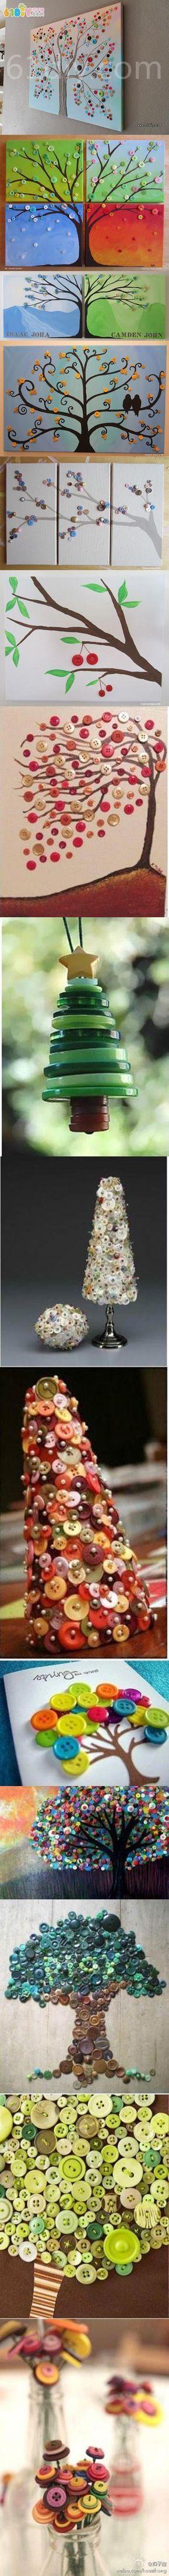 Creative Button Crafts - Trees | iCreativeIdeas.com Like Us on Facebook ==> https://www.facebook.com/icreativeideas